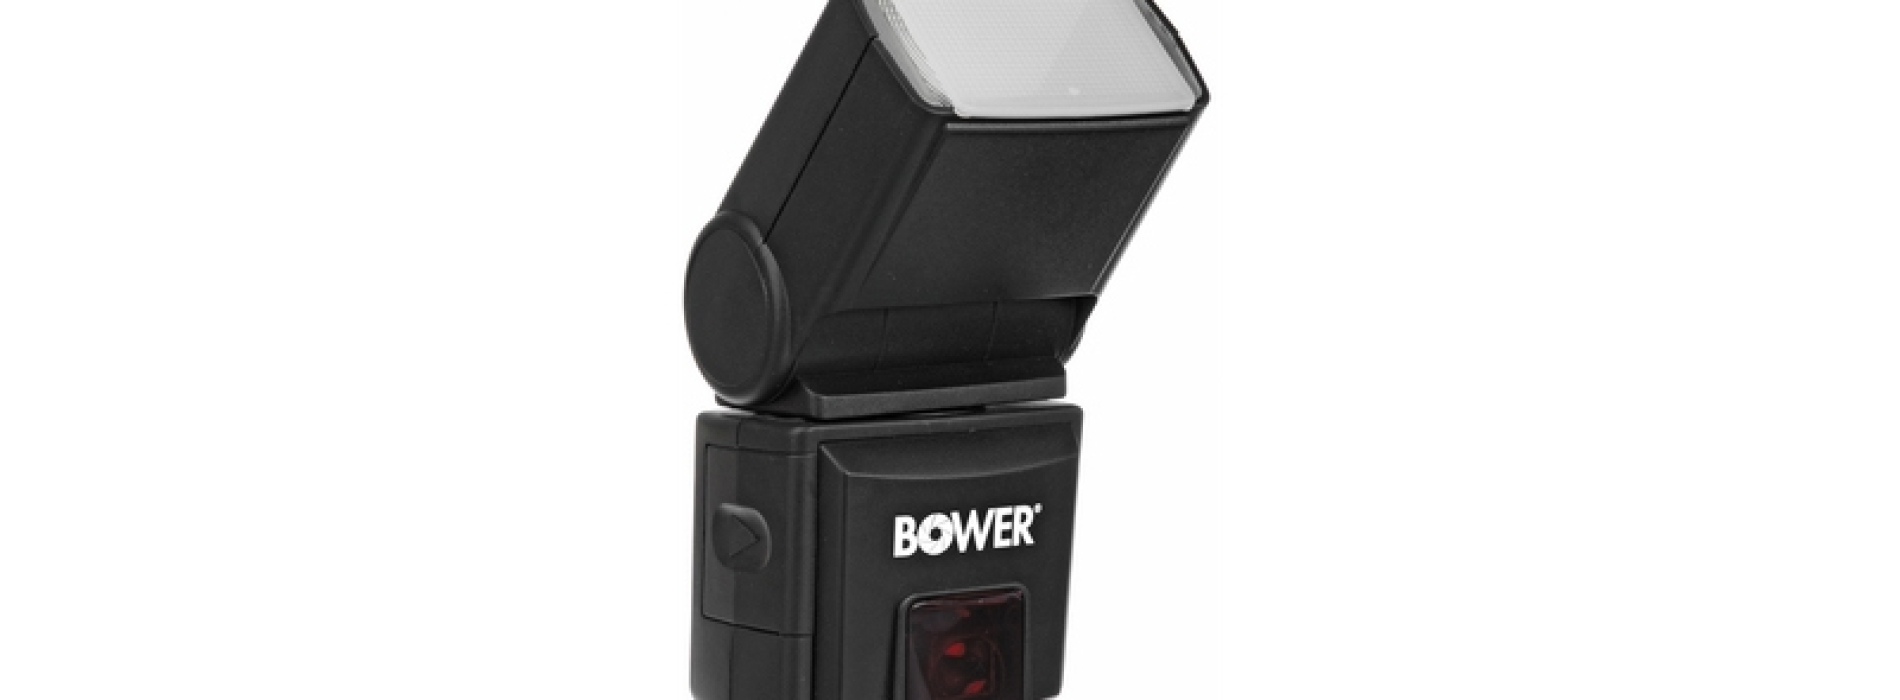 Ремонт вспышек Bower